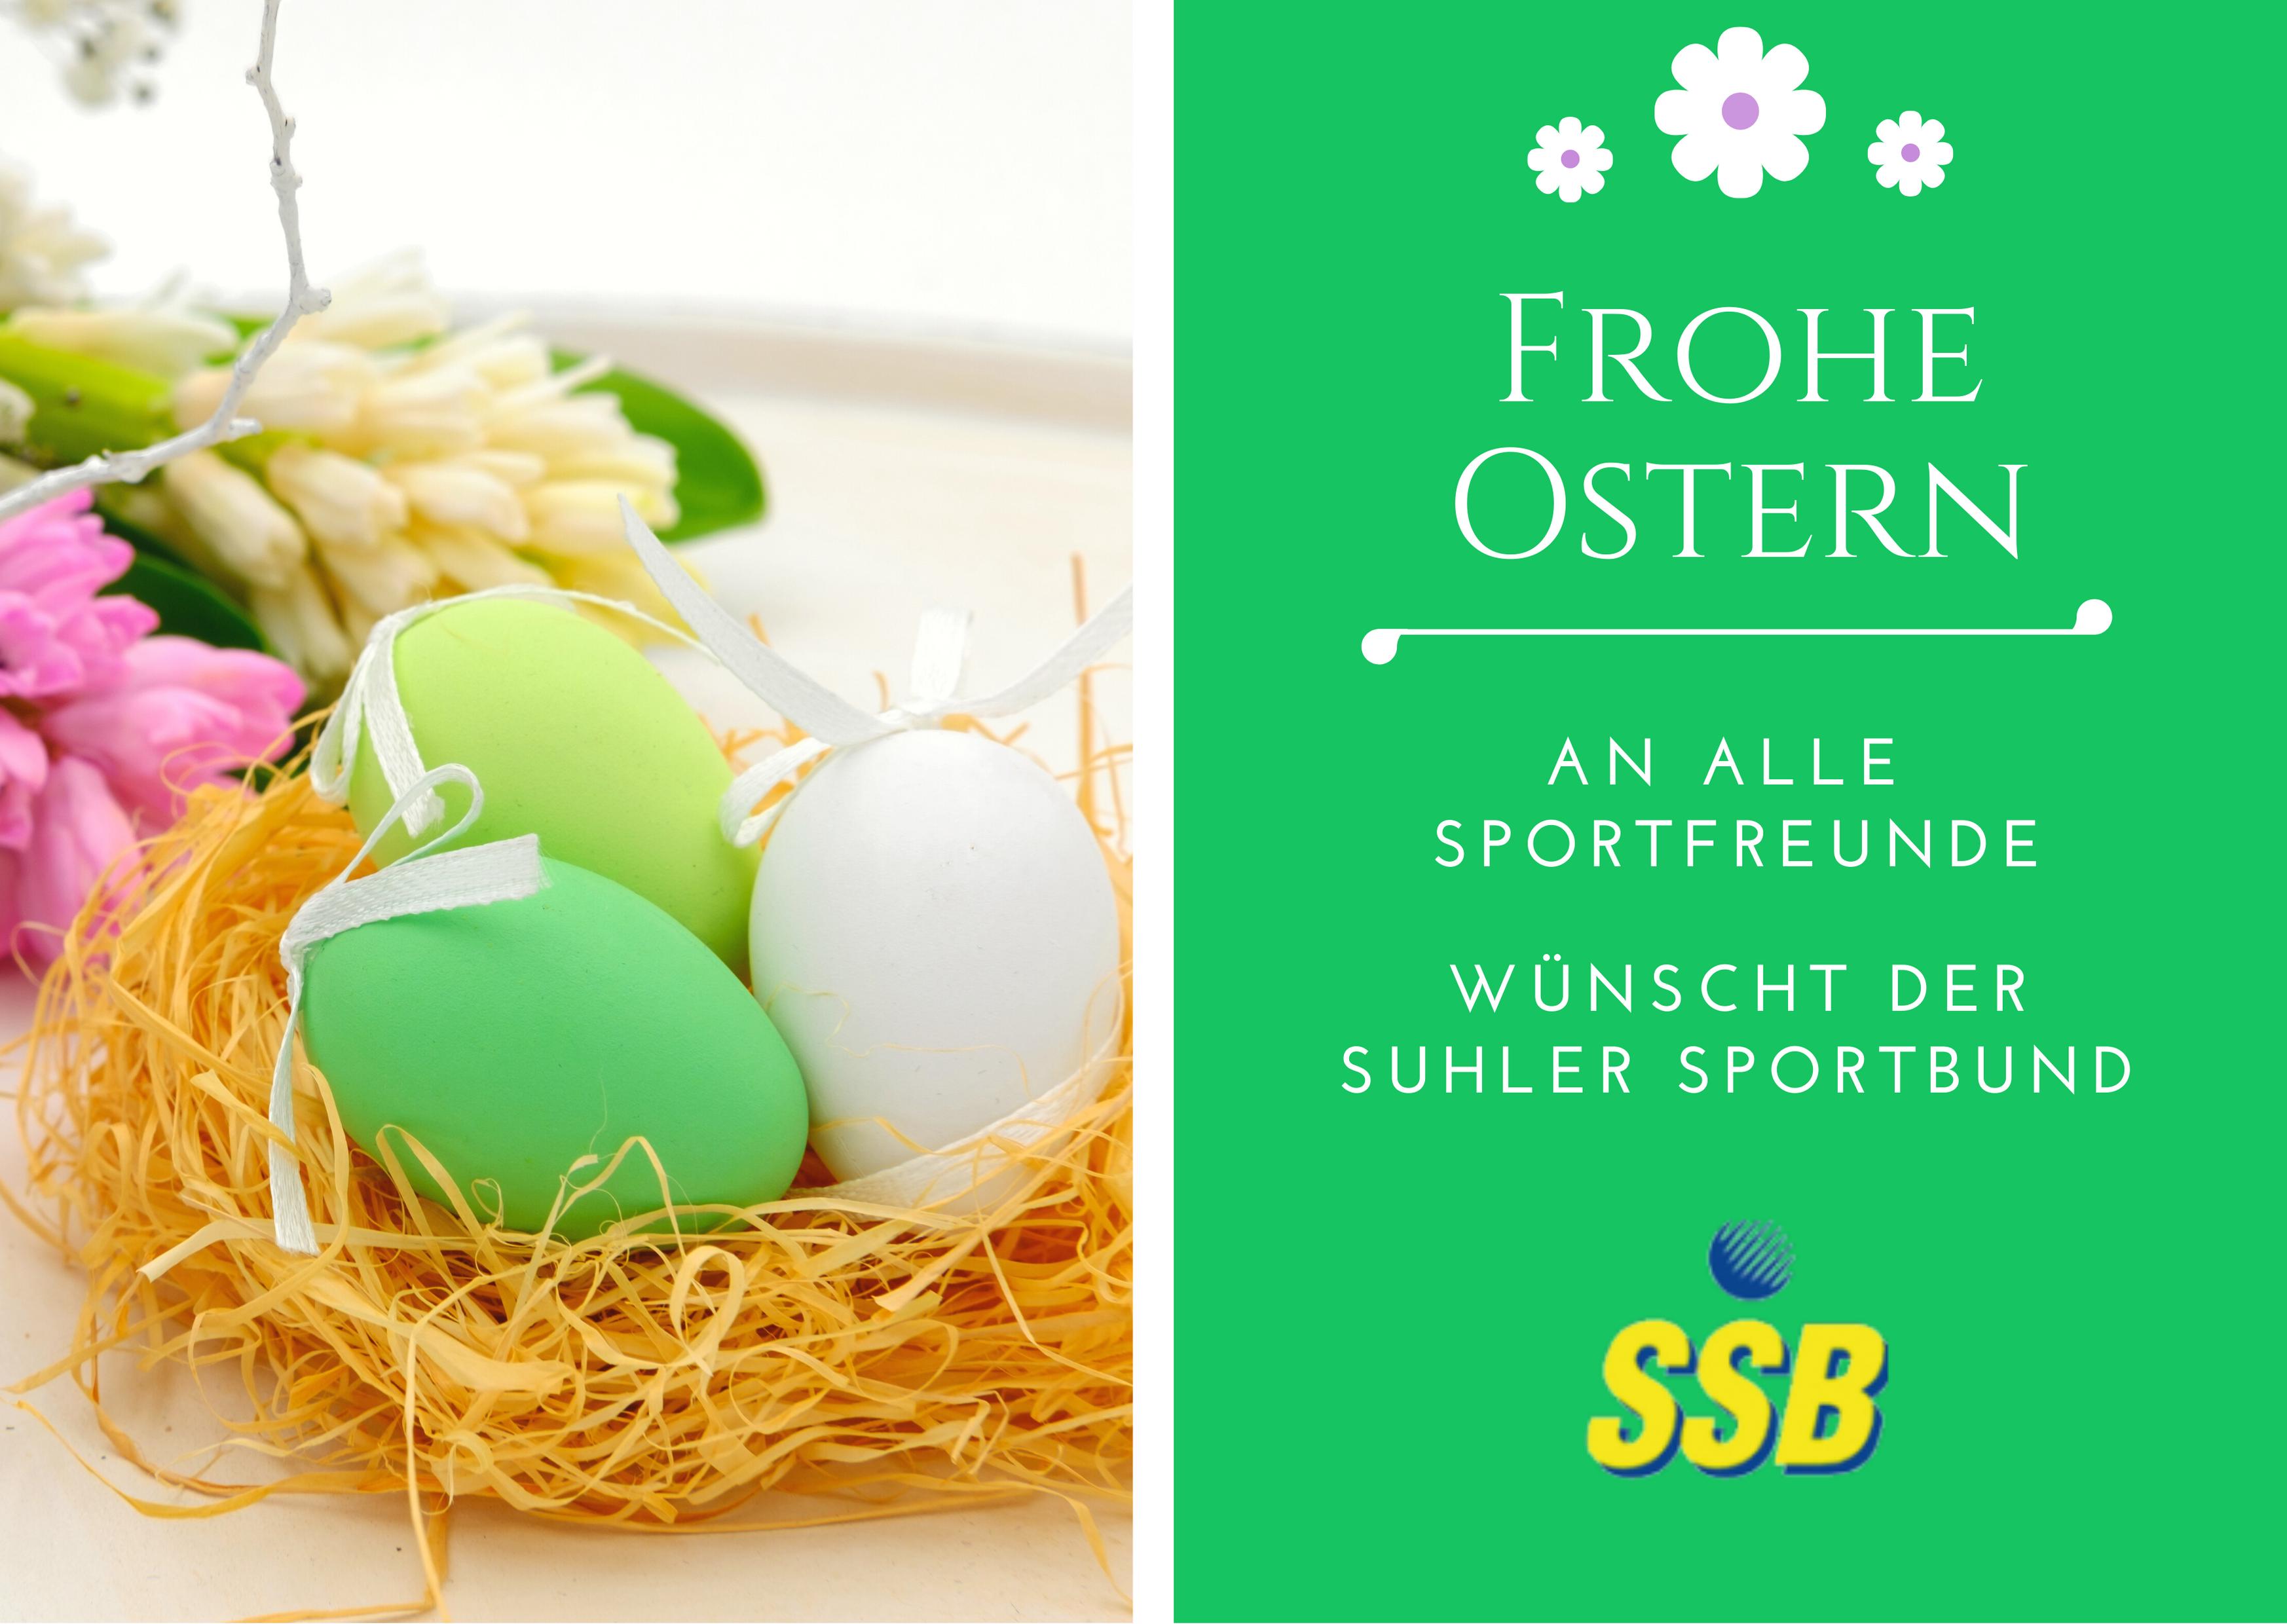 Frohe Ostern vom SSB